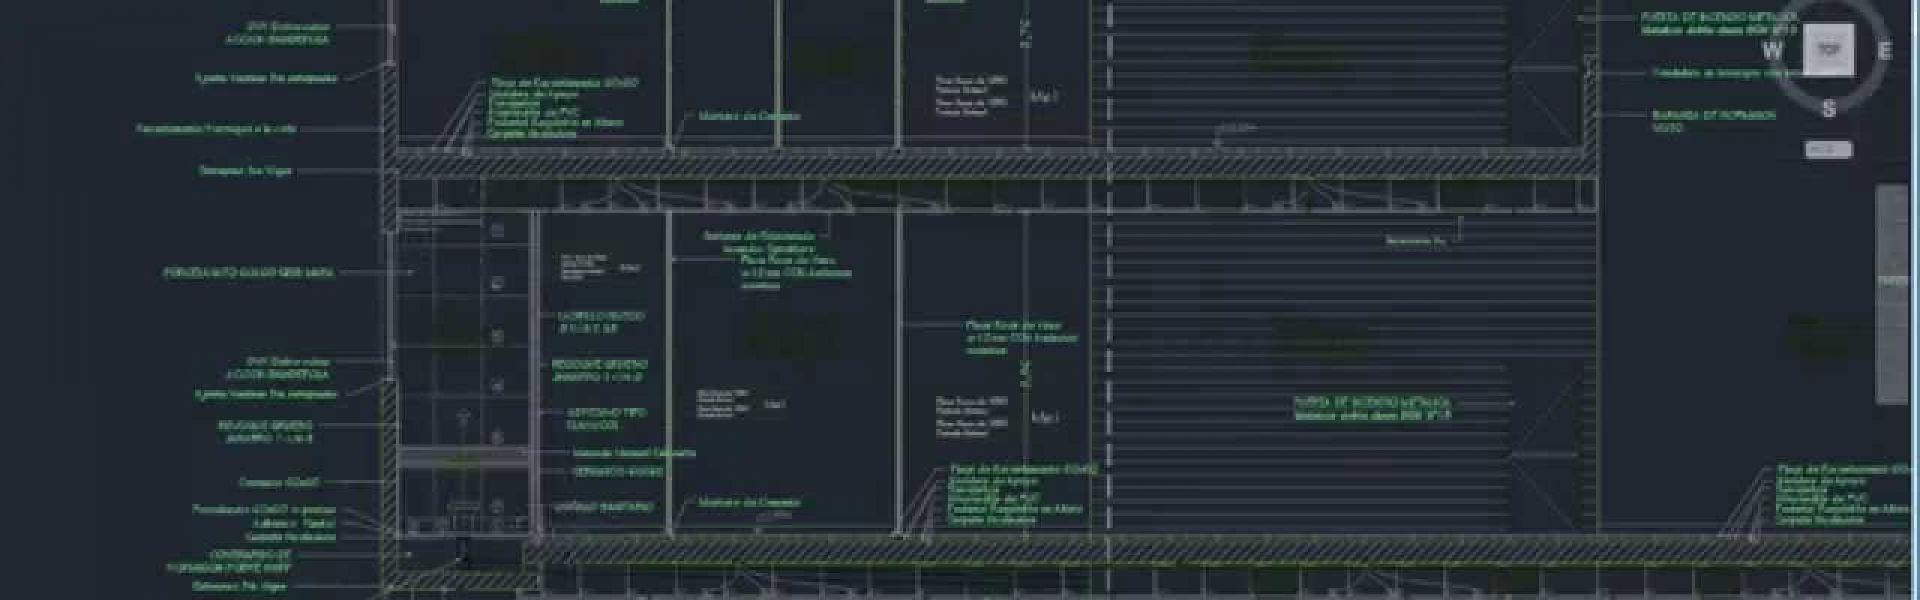 Clasimex.com AutoCAD - Tutorial for Beginners Autocad Featured Wood Topics